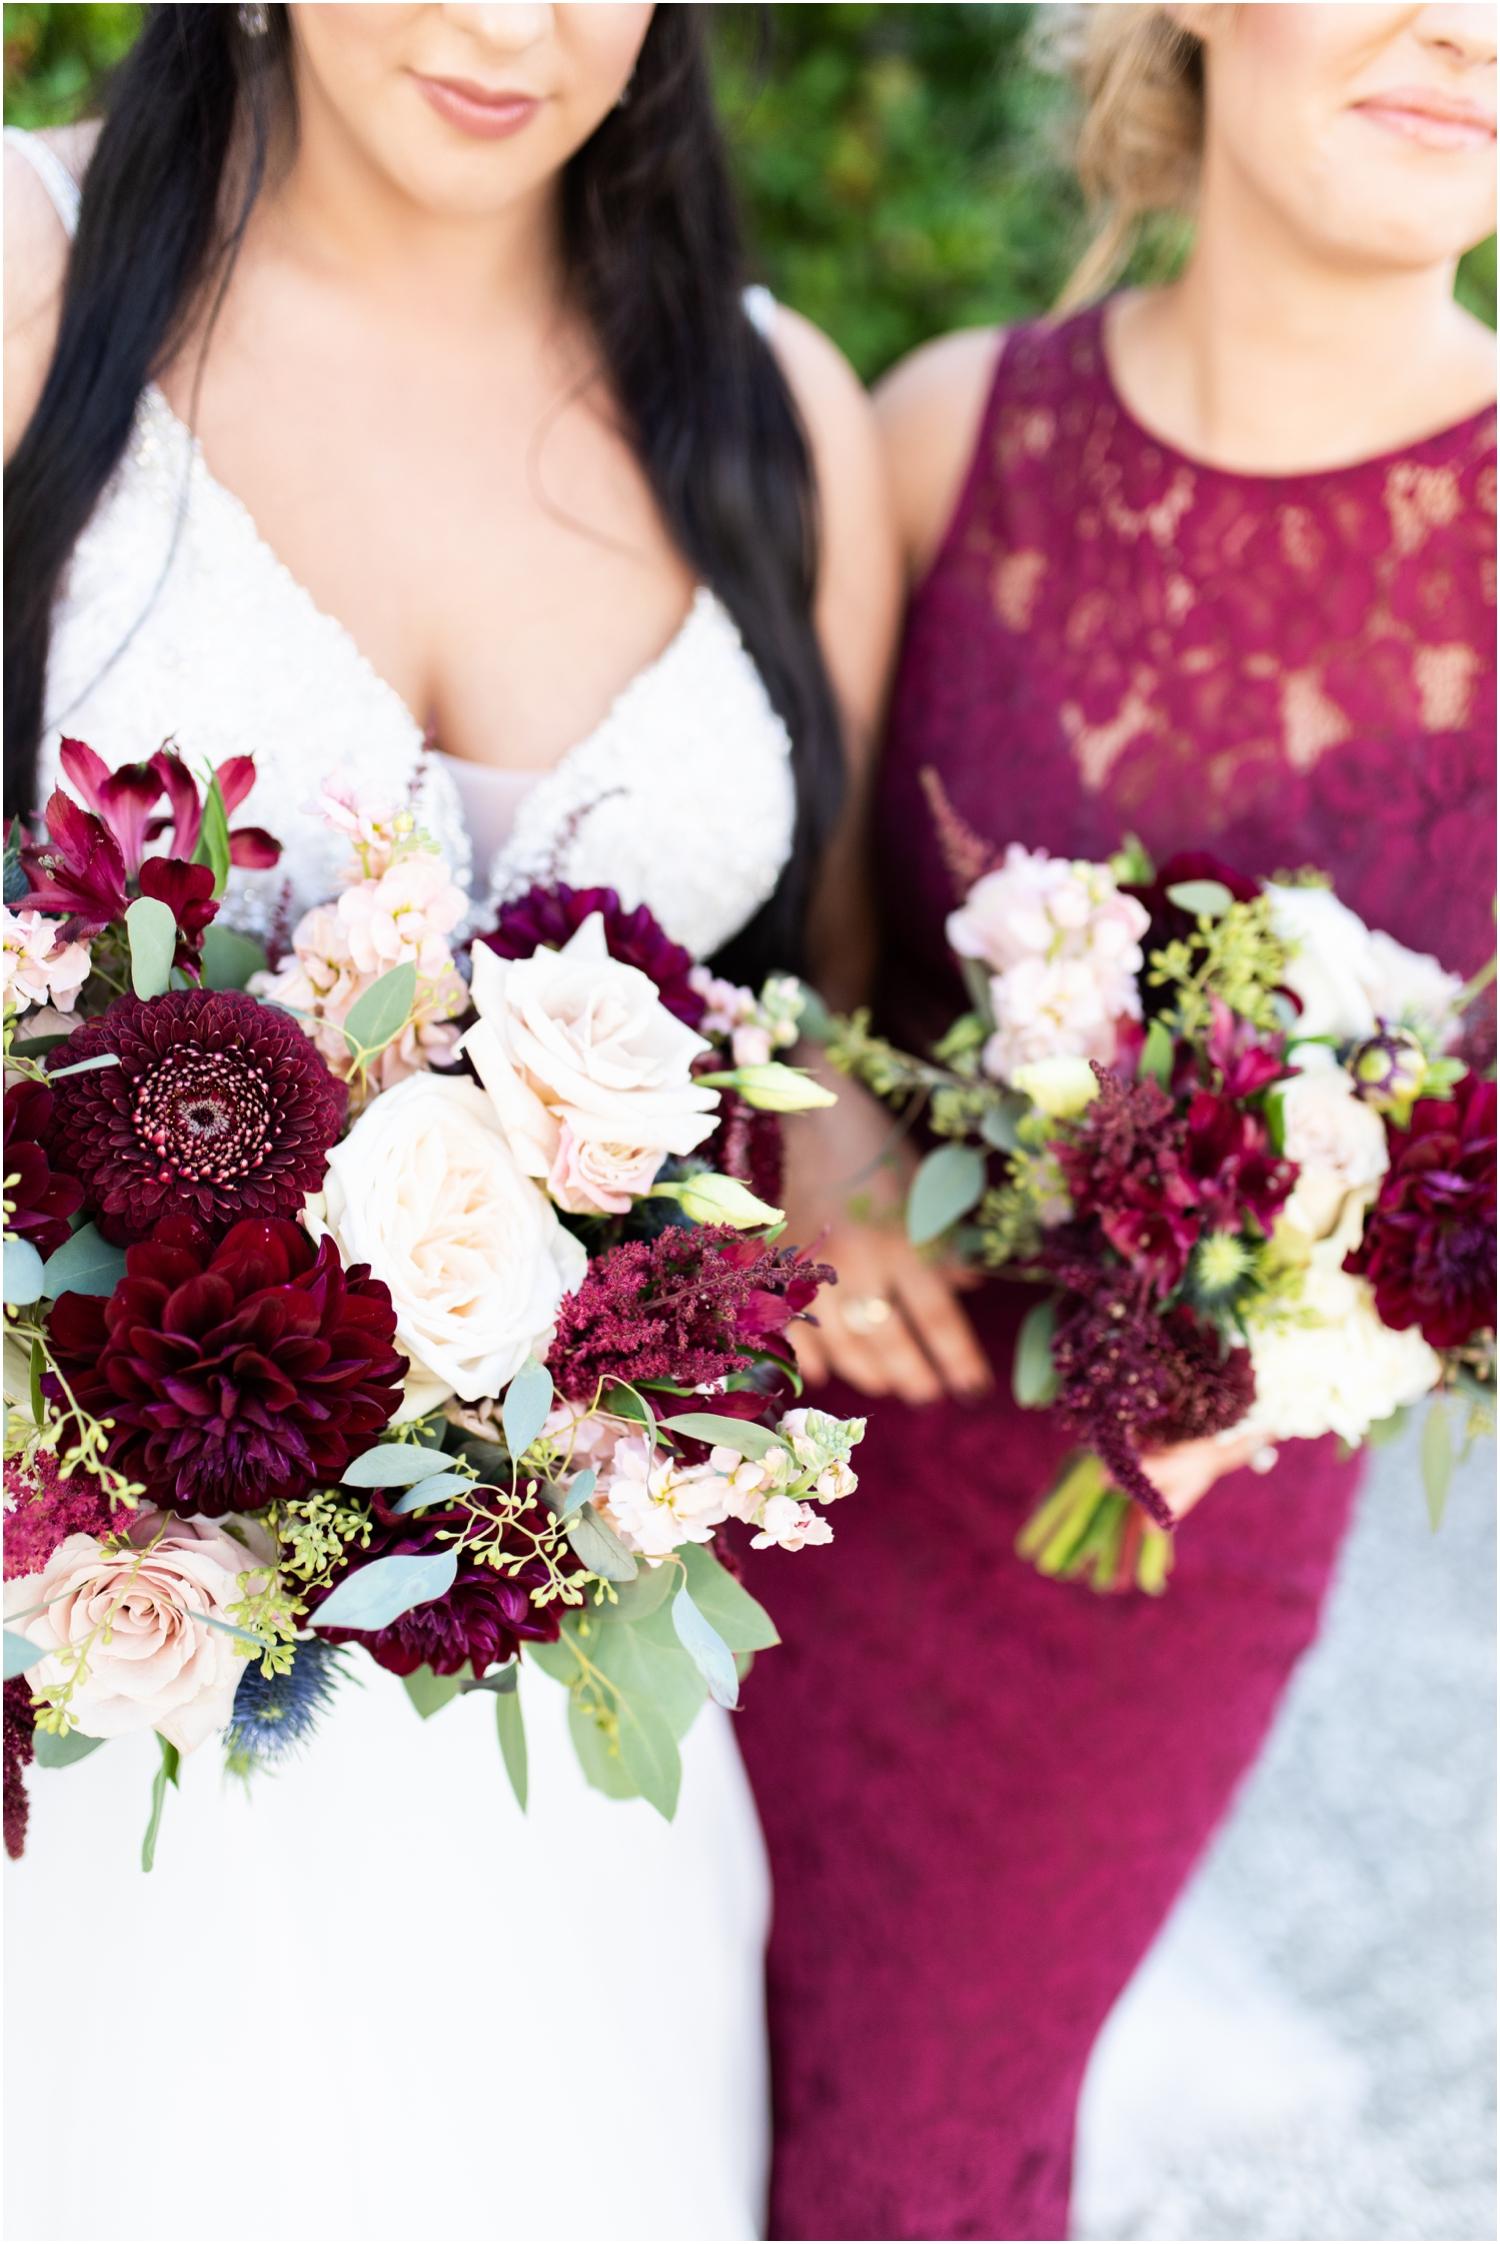 Henderson Beach Resort Inn Destin Florida Wedding Photographer Bride and bridesmaids florals bouquets